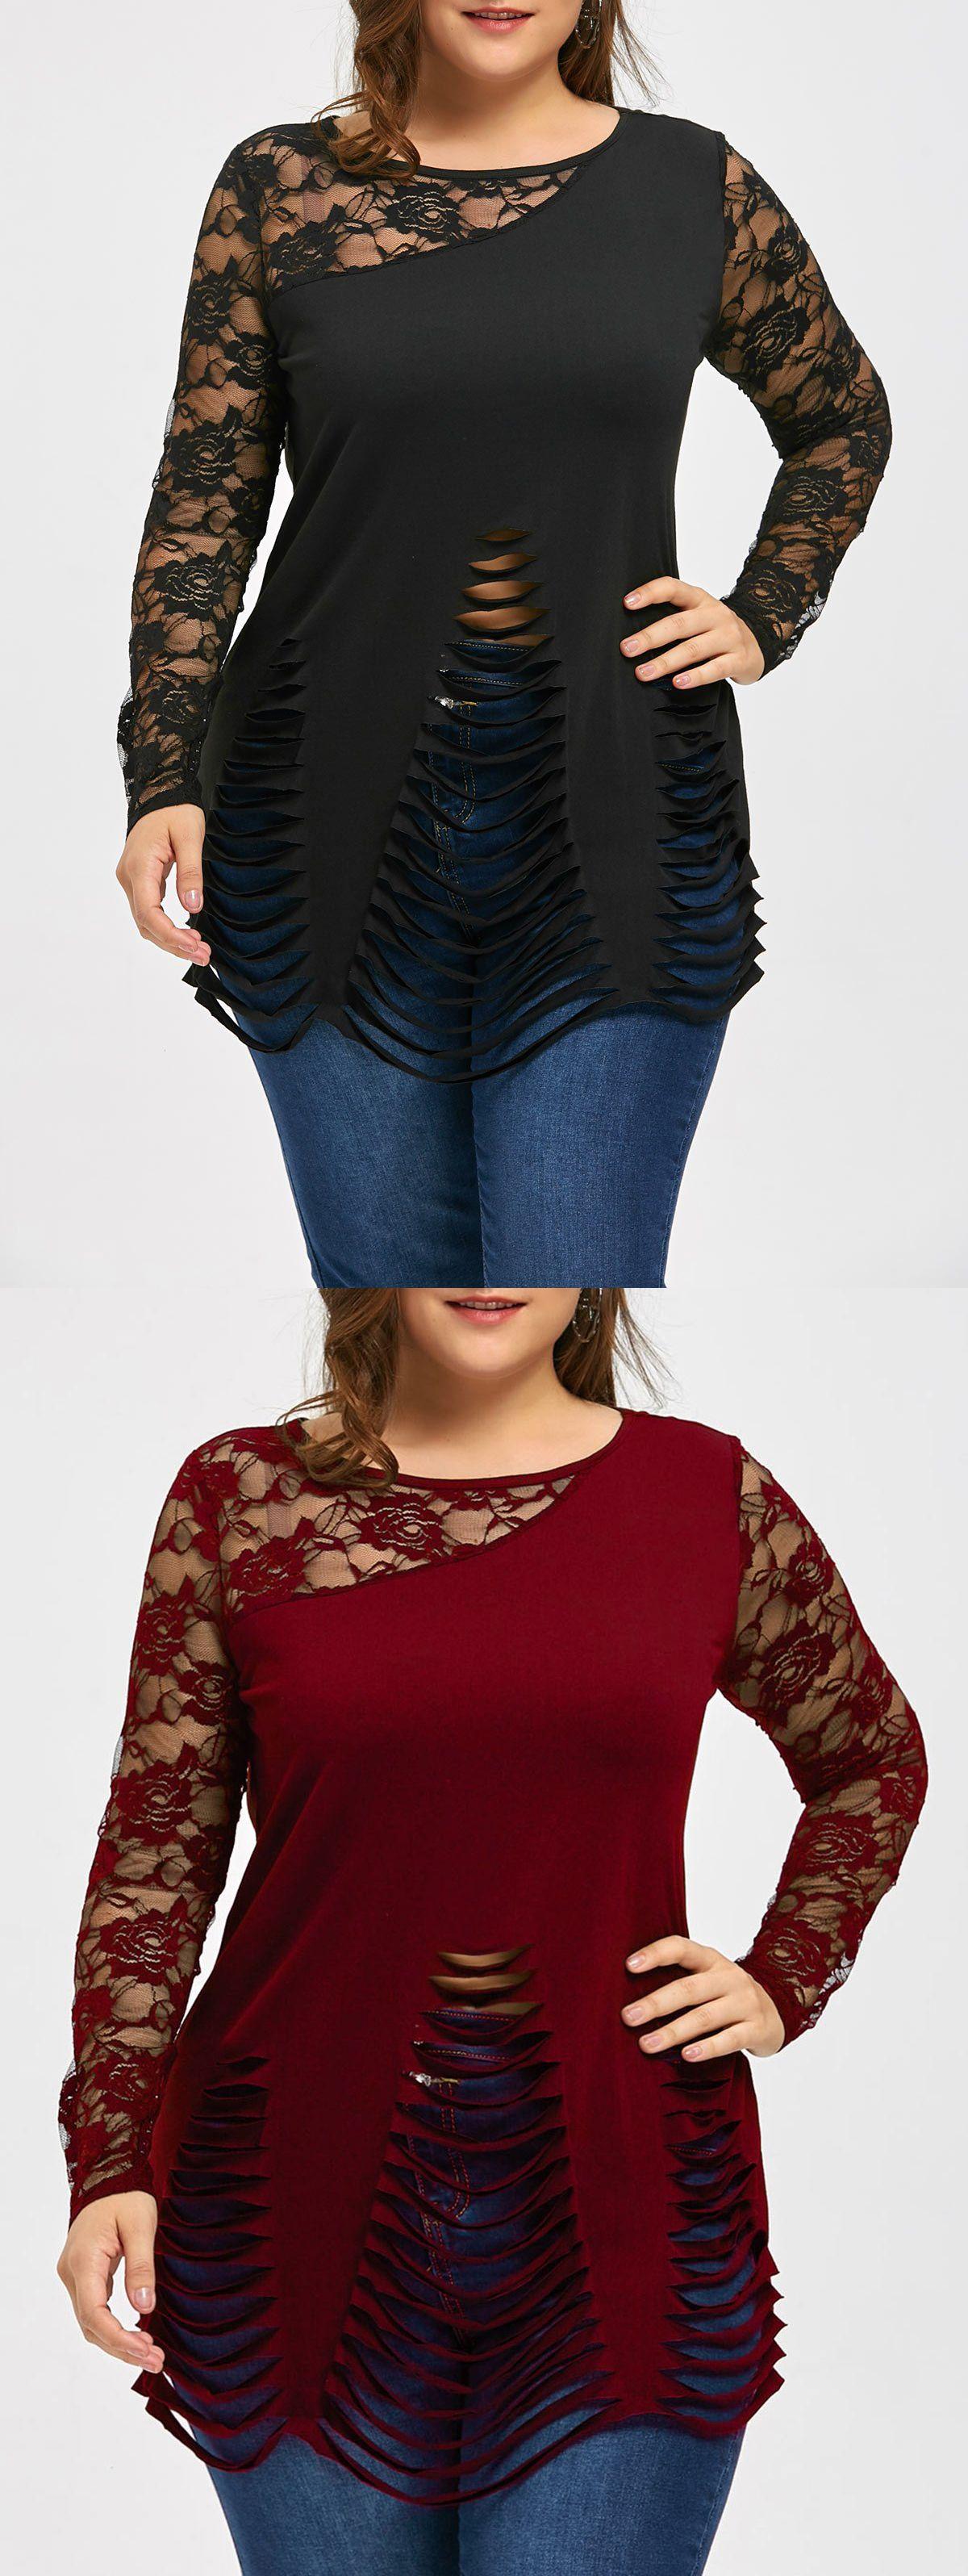 45678a0f419ab4 Wholesale Plus Size Lace Trim Ripped Top 5xl Black Online. Cheap Lace Trim  Top And Plus Size Jackets on Rosewholesale.com